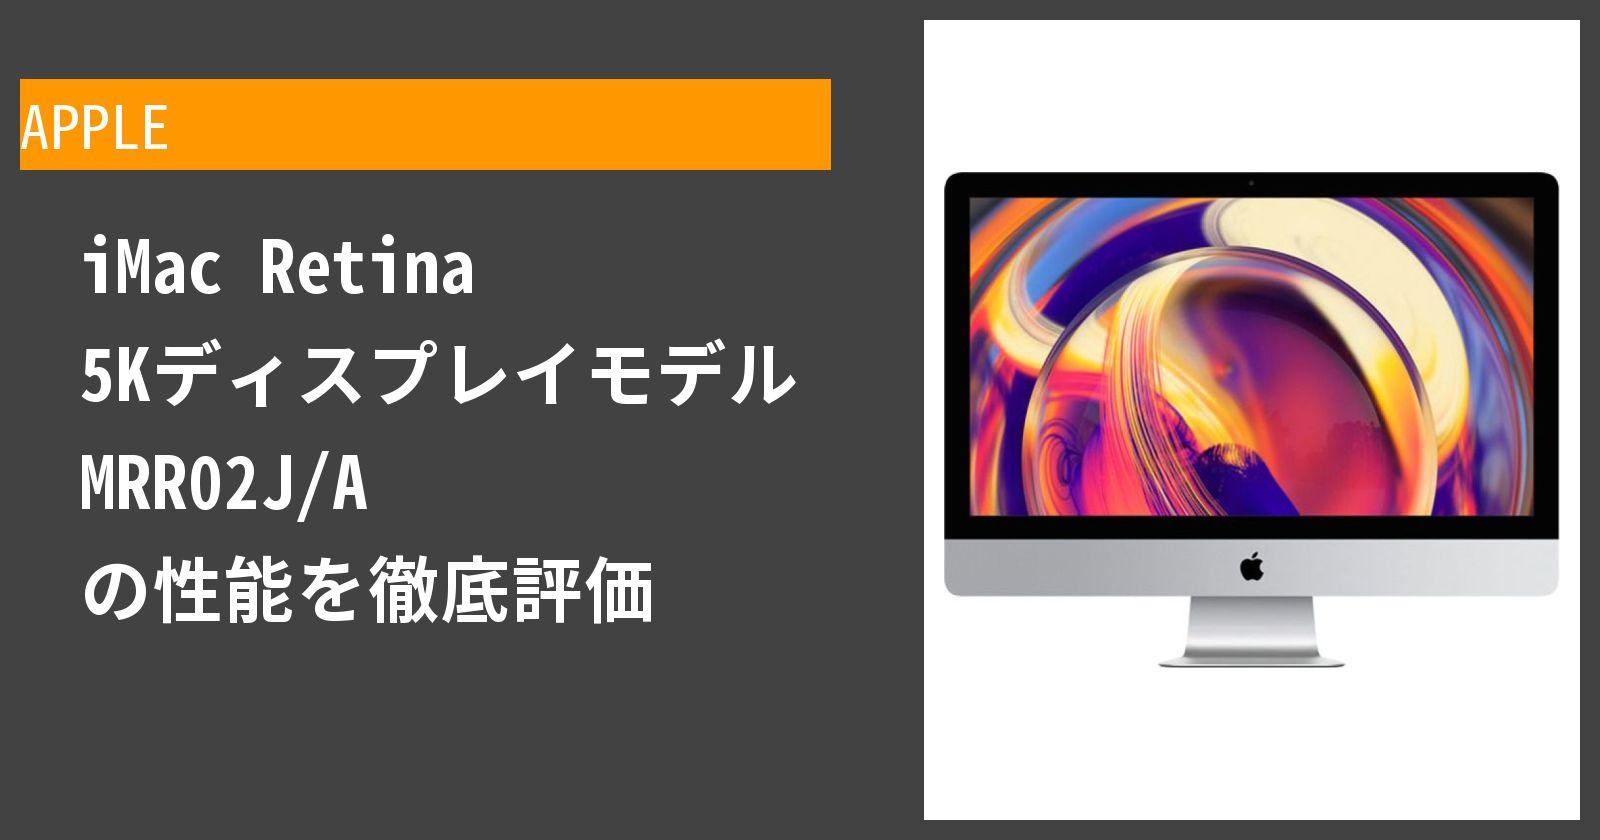 iMac Retina 5Kディスプレイモデル MRR02J/A の性能を徹底評価